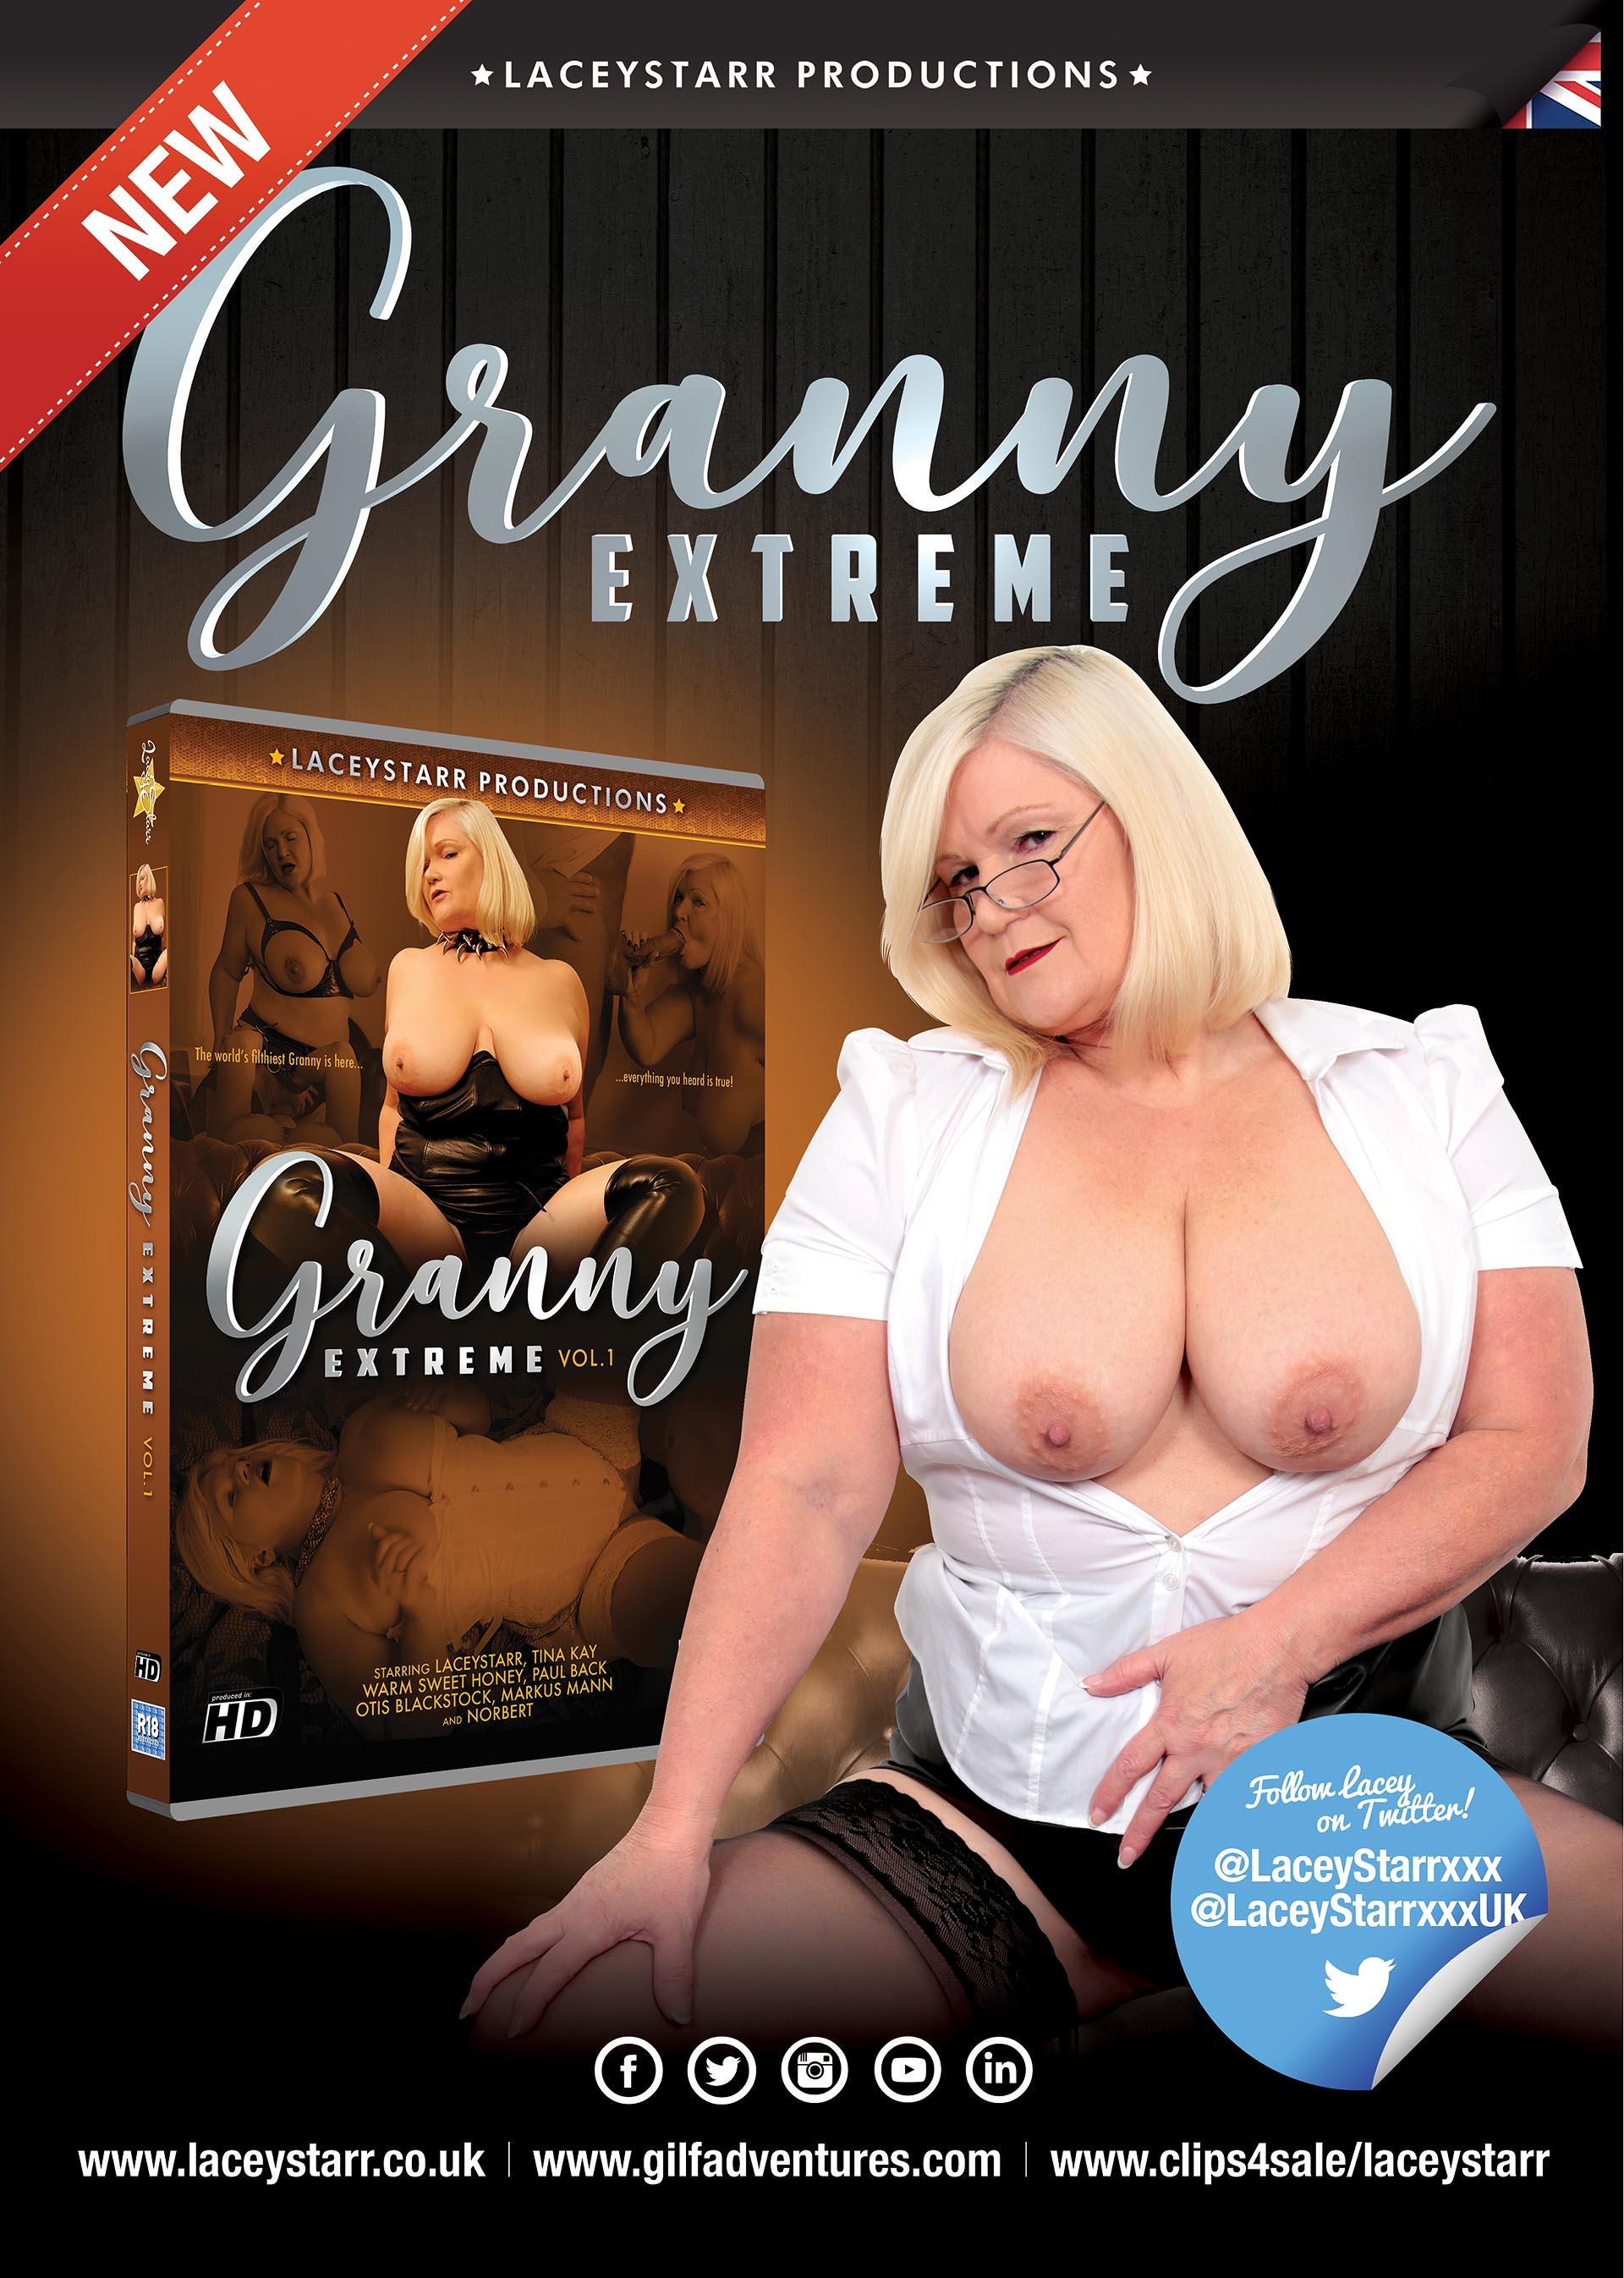 GrannyExtreme_Advert_Large.jpg